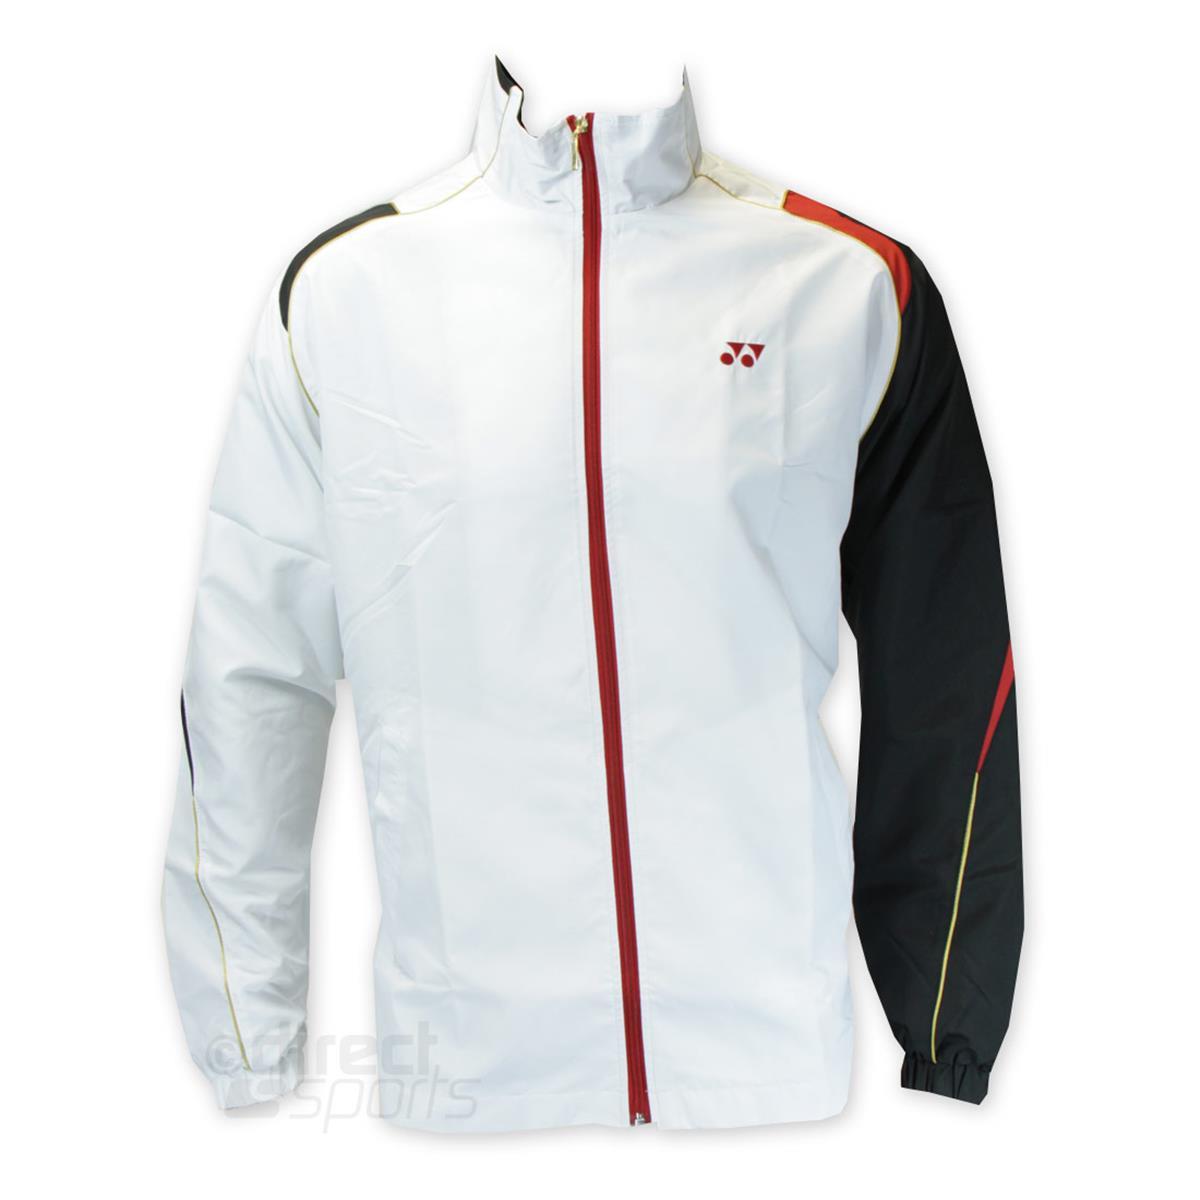 Yonex 52010ex Mens Warm Up Jacket Direct Tennis